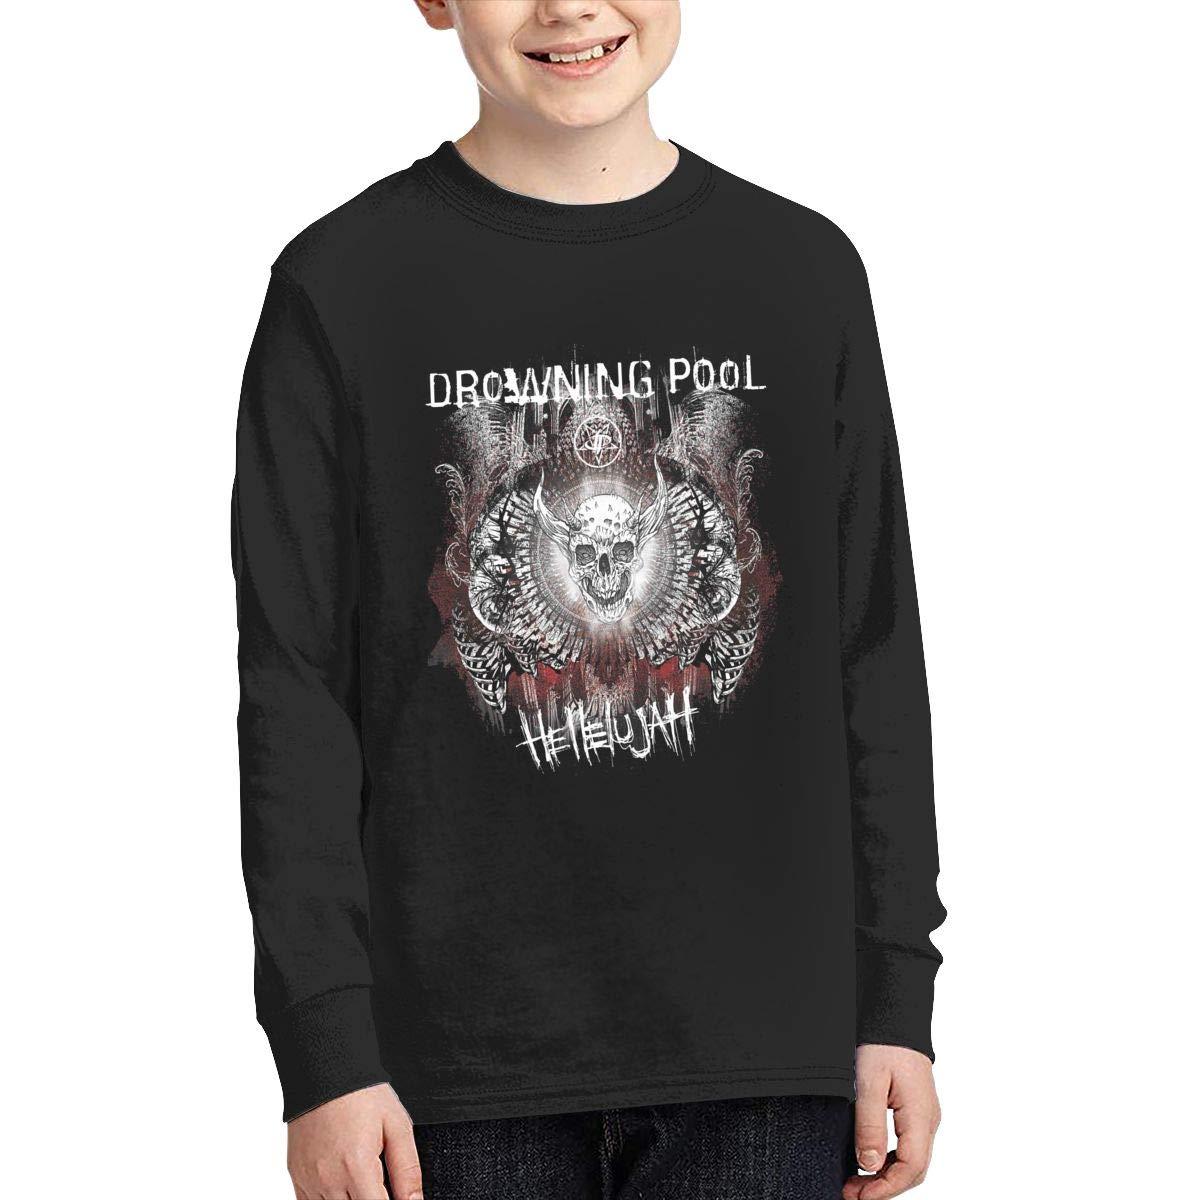 RhteGui Drowning Pool Boys /& Girls Junior Vintage Long Sleeve T-Shirt Black